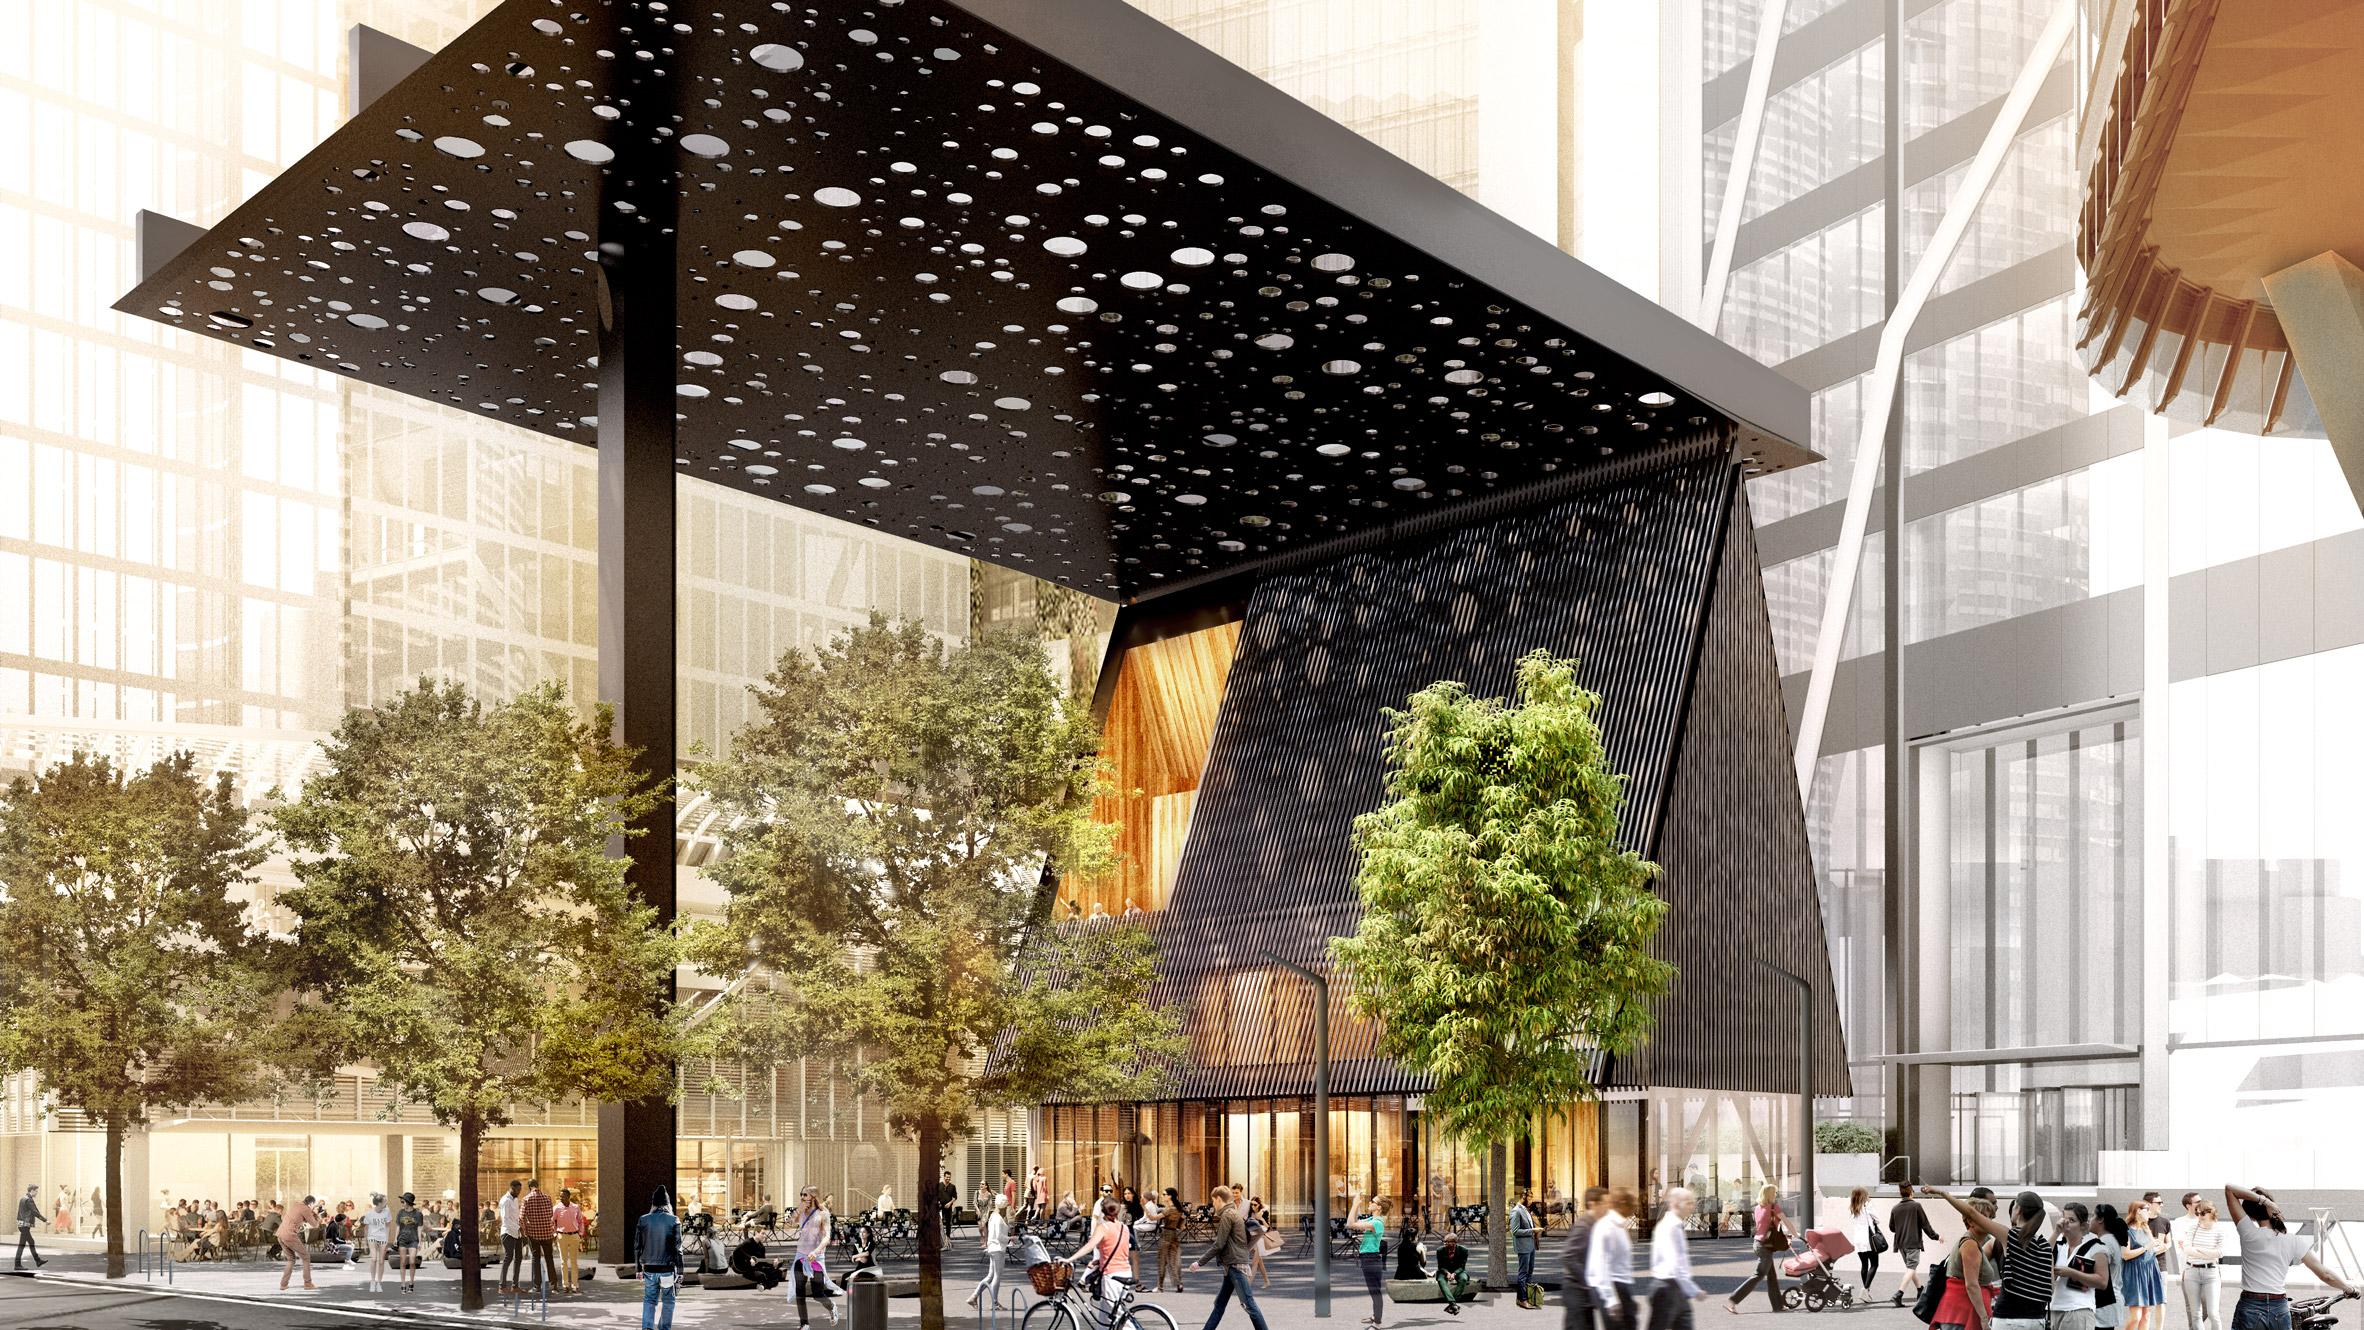 David Adjaye Designs Sydney Plaza To Evoke Aboriginal Paintings